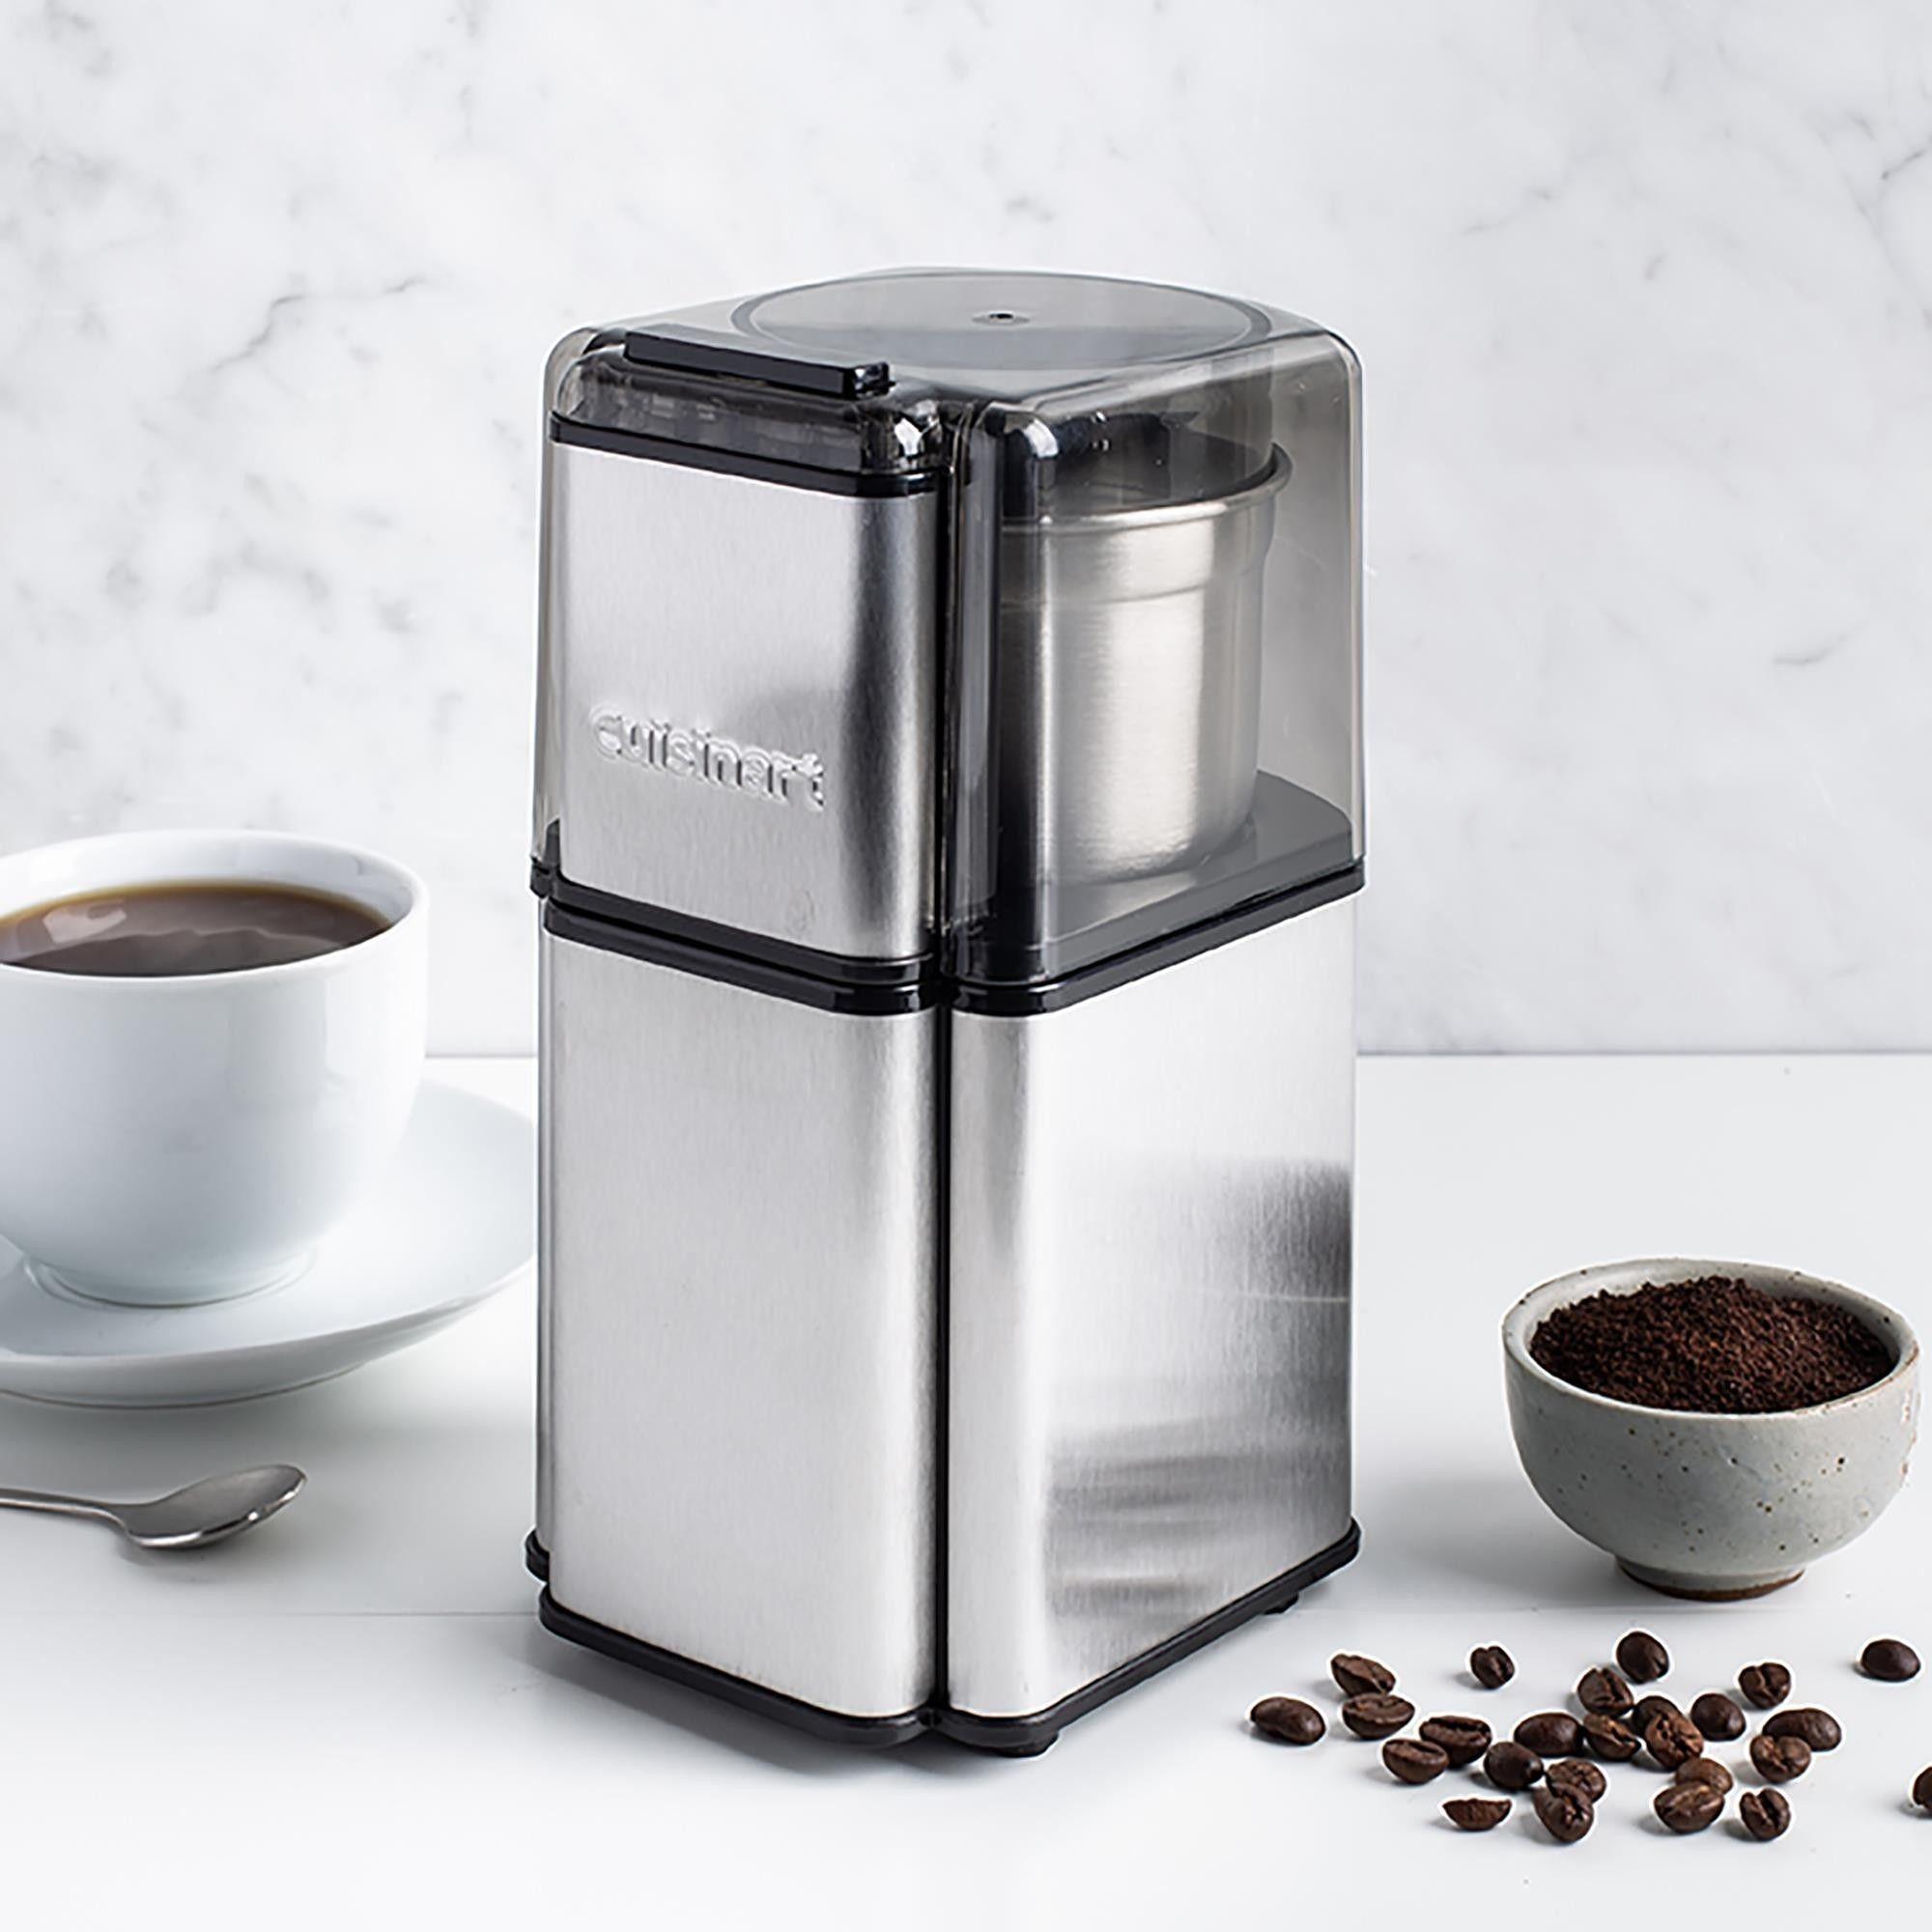 Cuisinart central coffee grinder coffee grinder